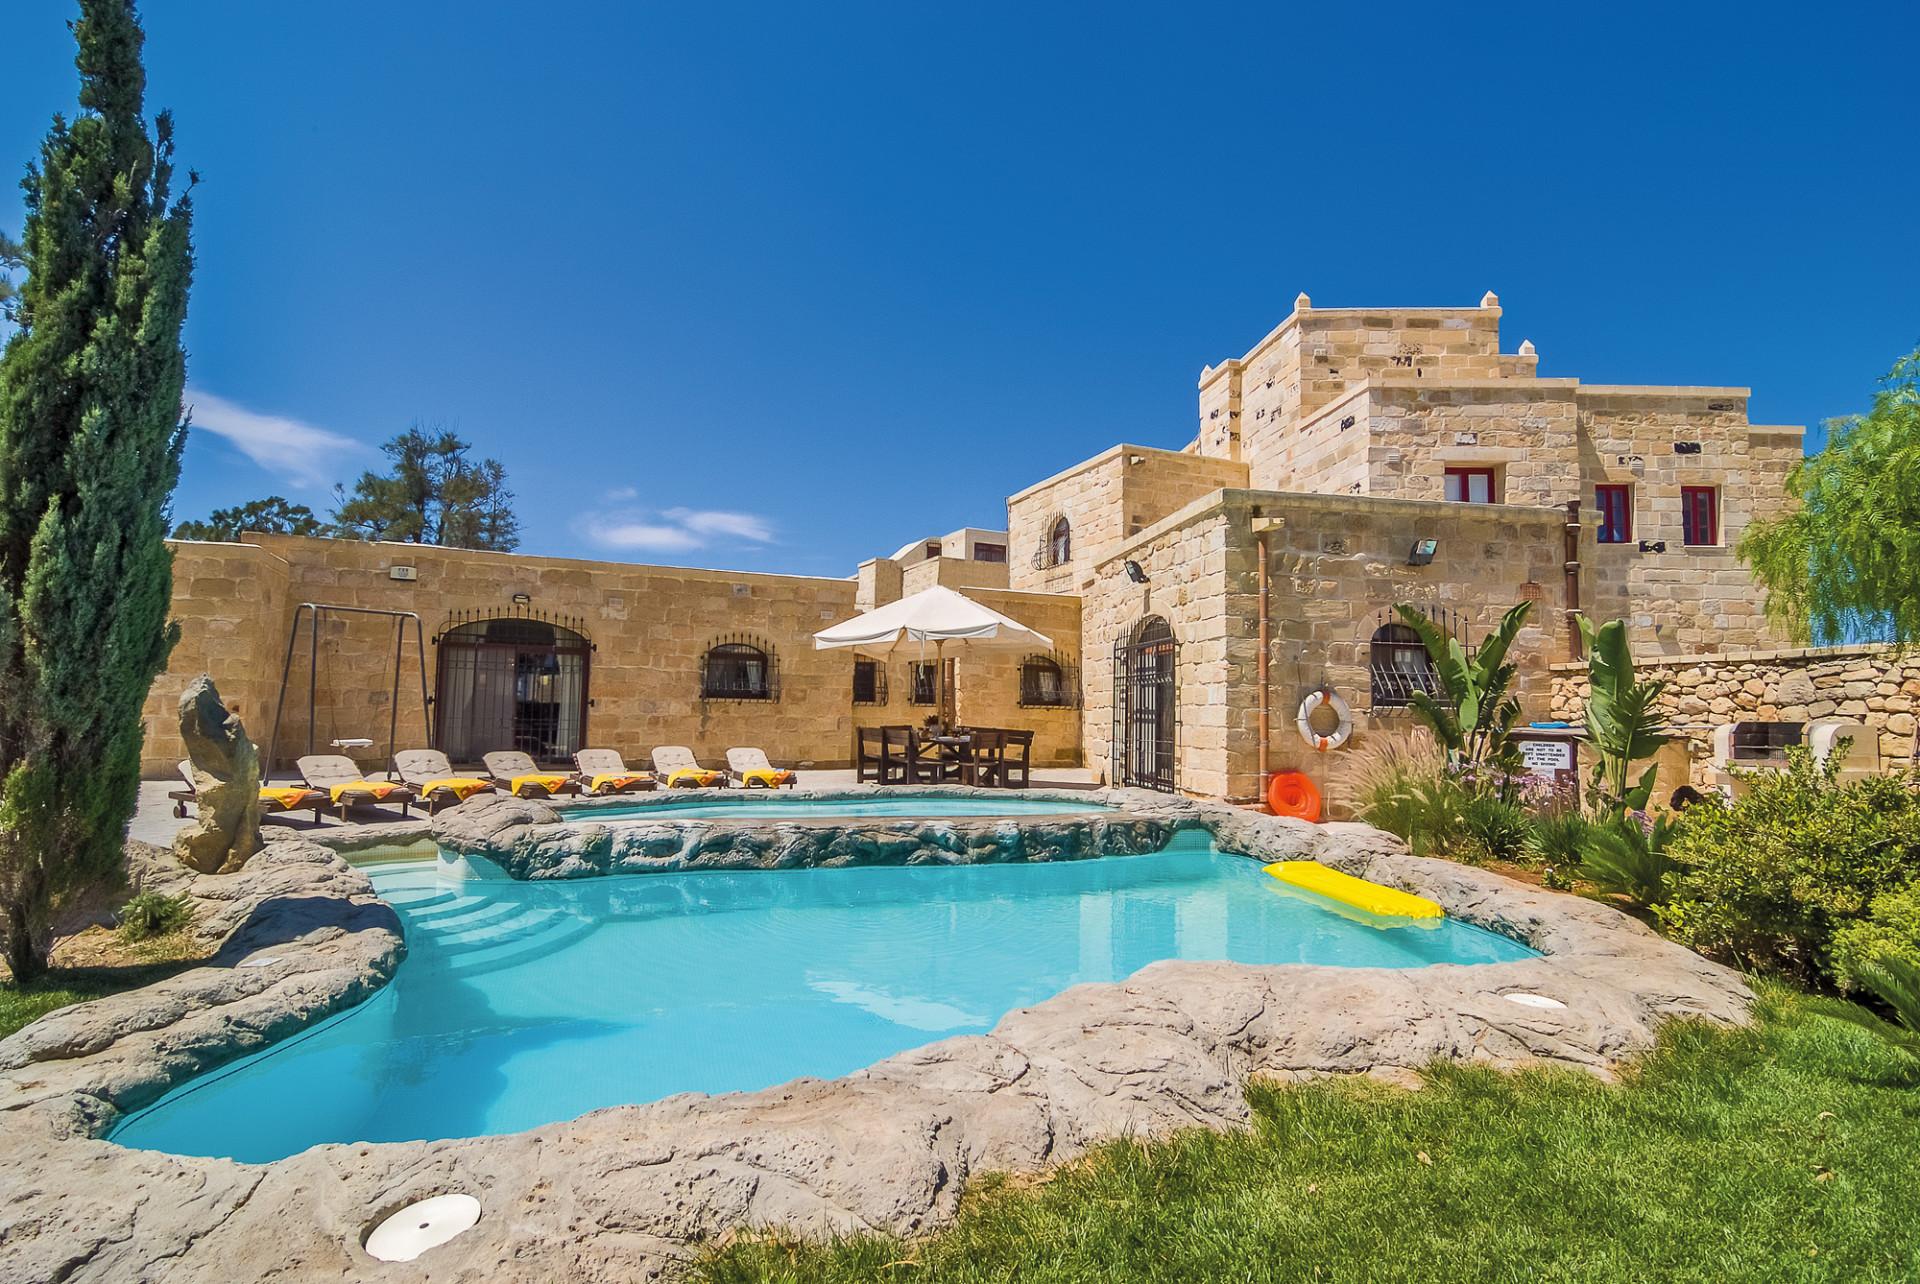 Villa The Chateau met privézwembad, Zejtun, Malta